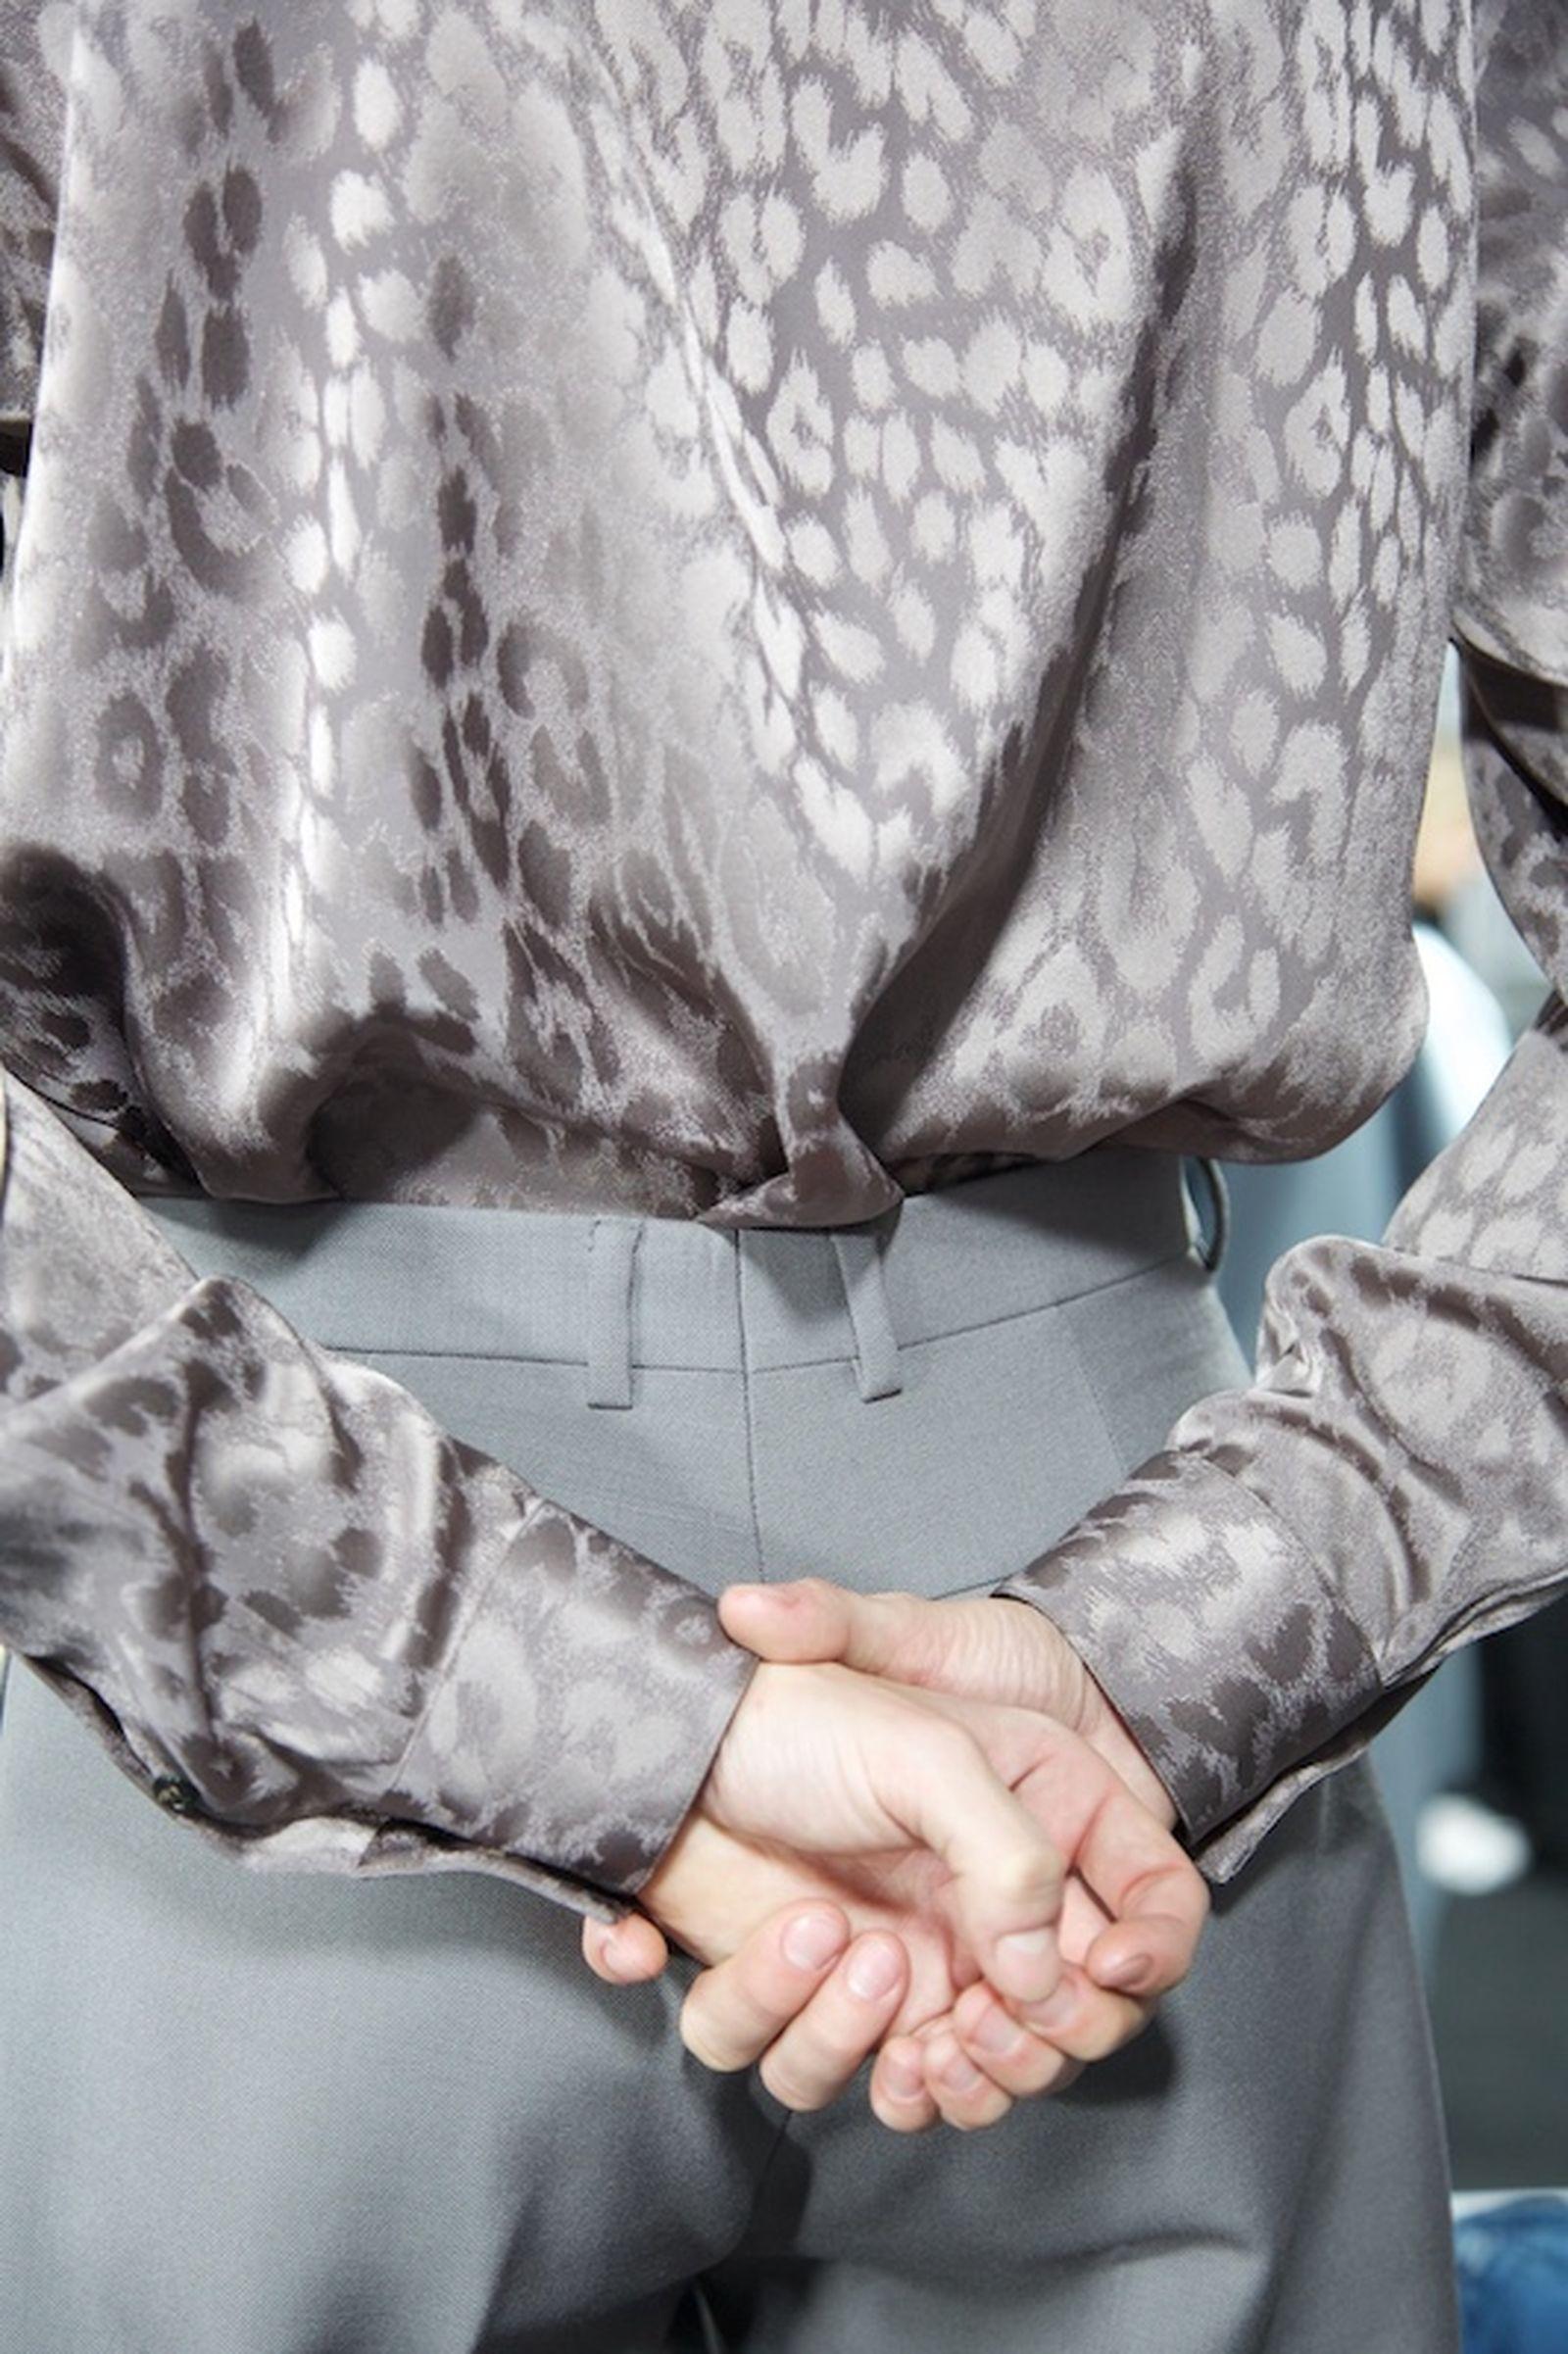 Dior Men's Winter 2019 2020 Collection